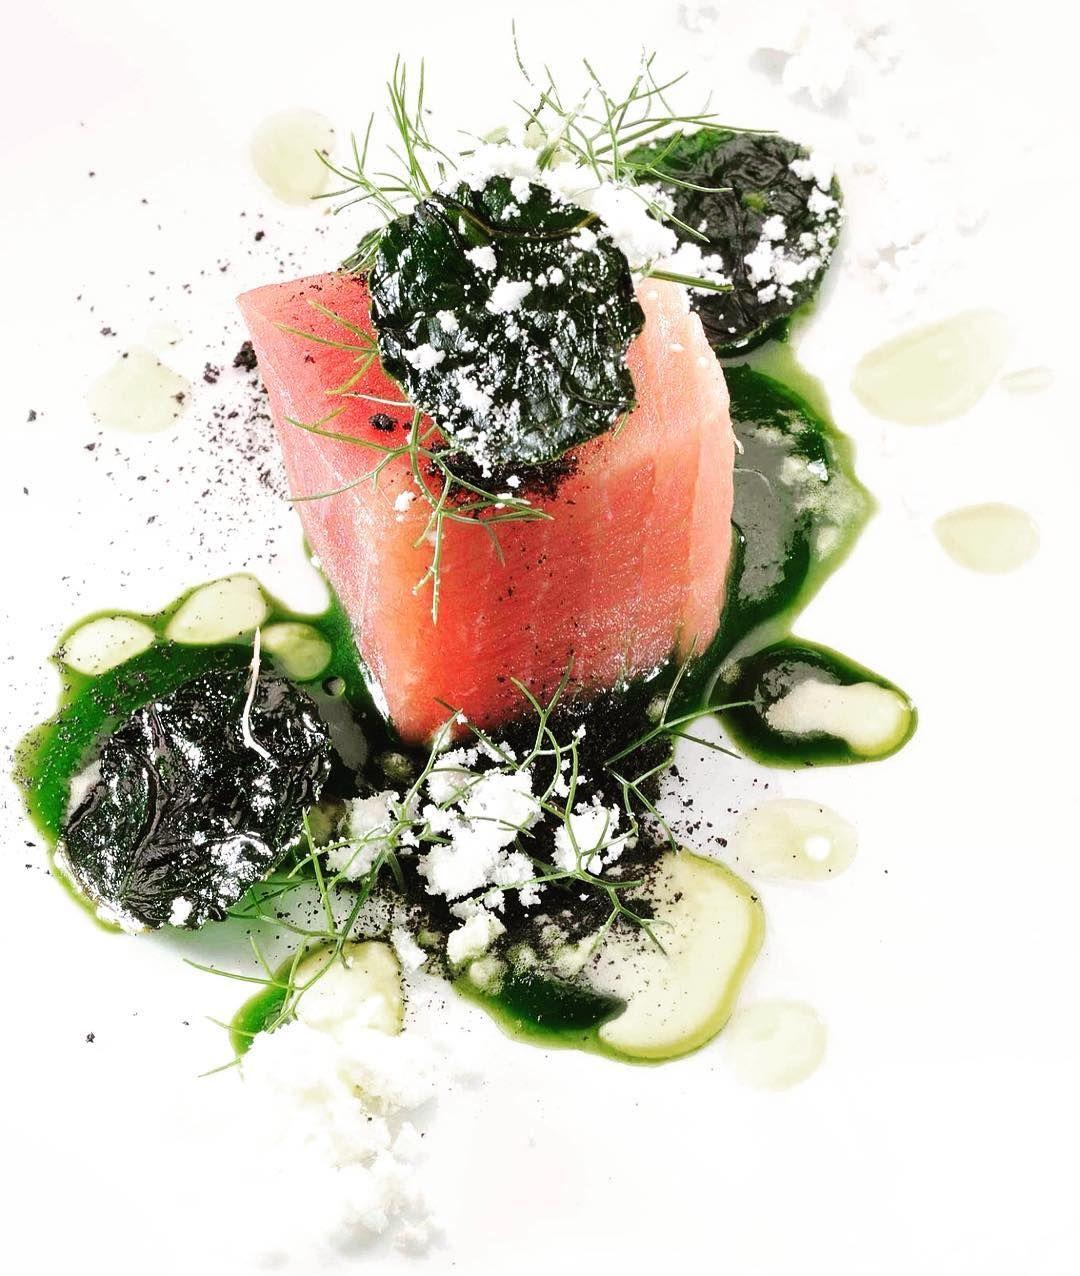 Lo Chef JRE Luigi Pomata di Cagliari... anteprima del nuovo volume Italian Gourmet. Foto Paolo Picciotto  #jreitalia #jrericette #gourmet #instafood #tonno #cagliari @luigipomata @antonellaprovetti #antonellaprovetti #ristoranteluigipomata #sardiniaexperience #italianfood #gooditalianfood #passionforfood #goodfish #tonno #tonnorosso #luxury #colour #creativity #instafood #foodie #gourmet #italiangourmet  @italiangourmet #foodpic #foodphotografy  ##amazing #delicious #theartofplating by…